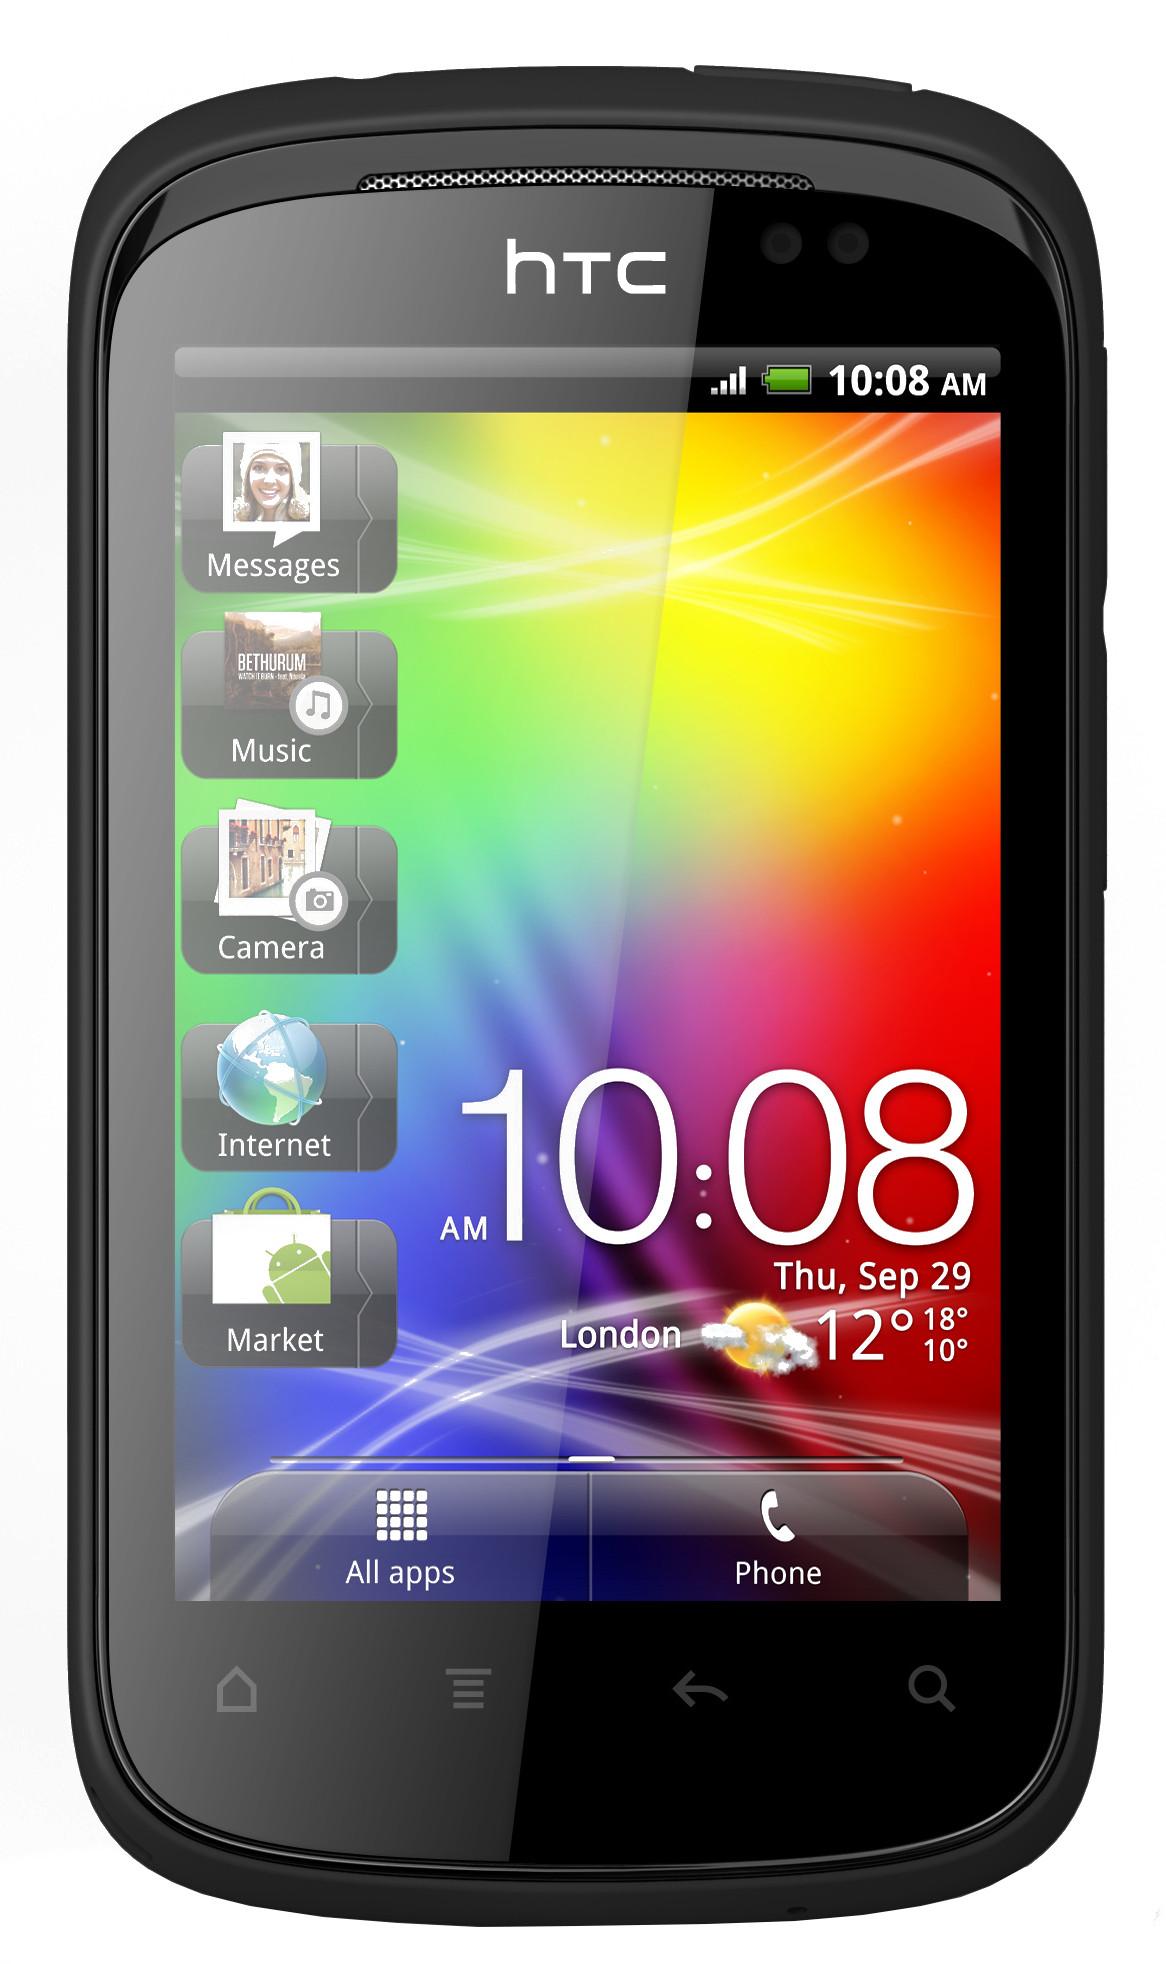 HTC Explorer (512MB RAM, 512MB)